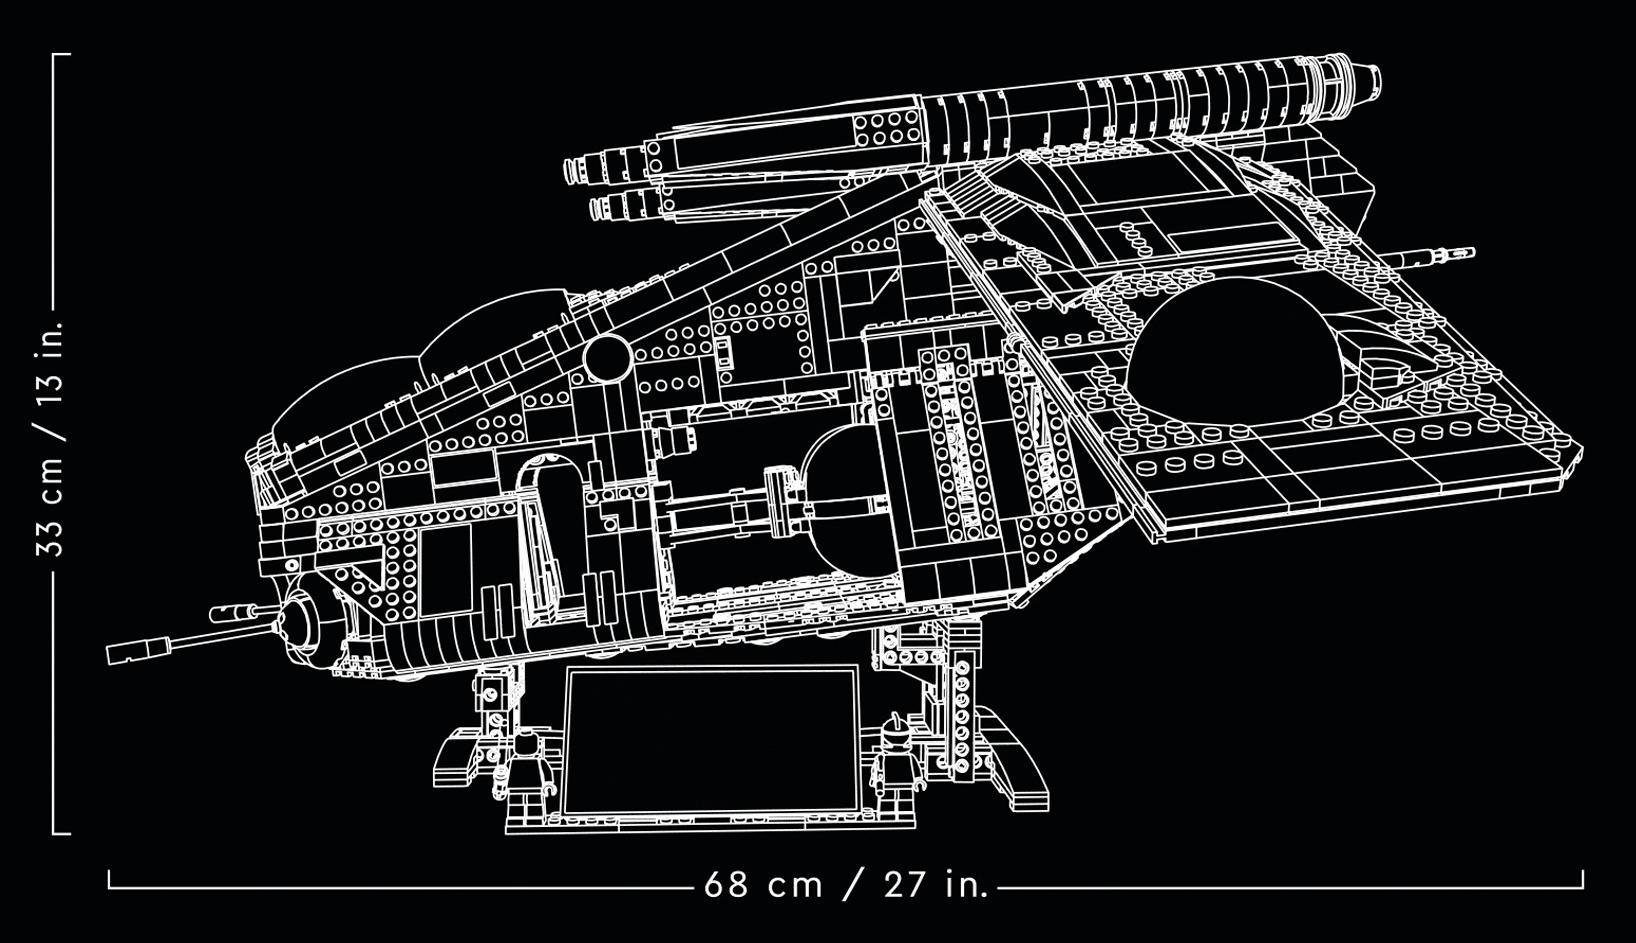 LEGO Star Wars 75309 Ucs Republic Gunship Measurements